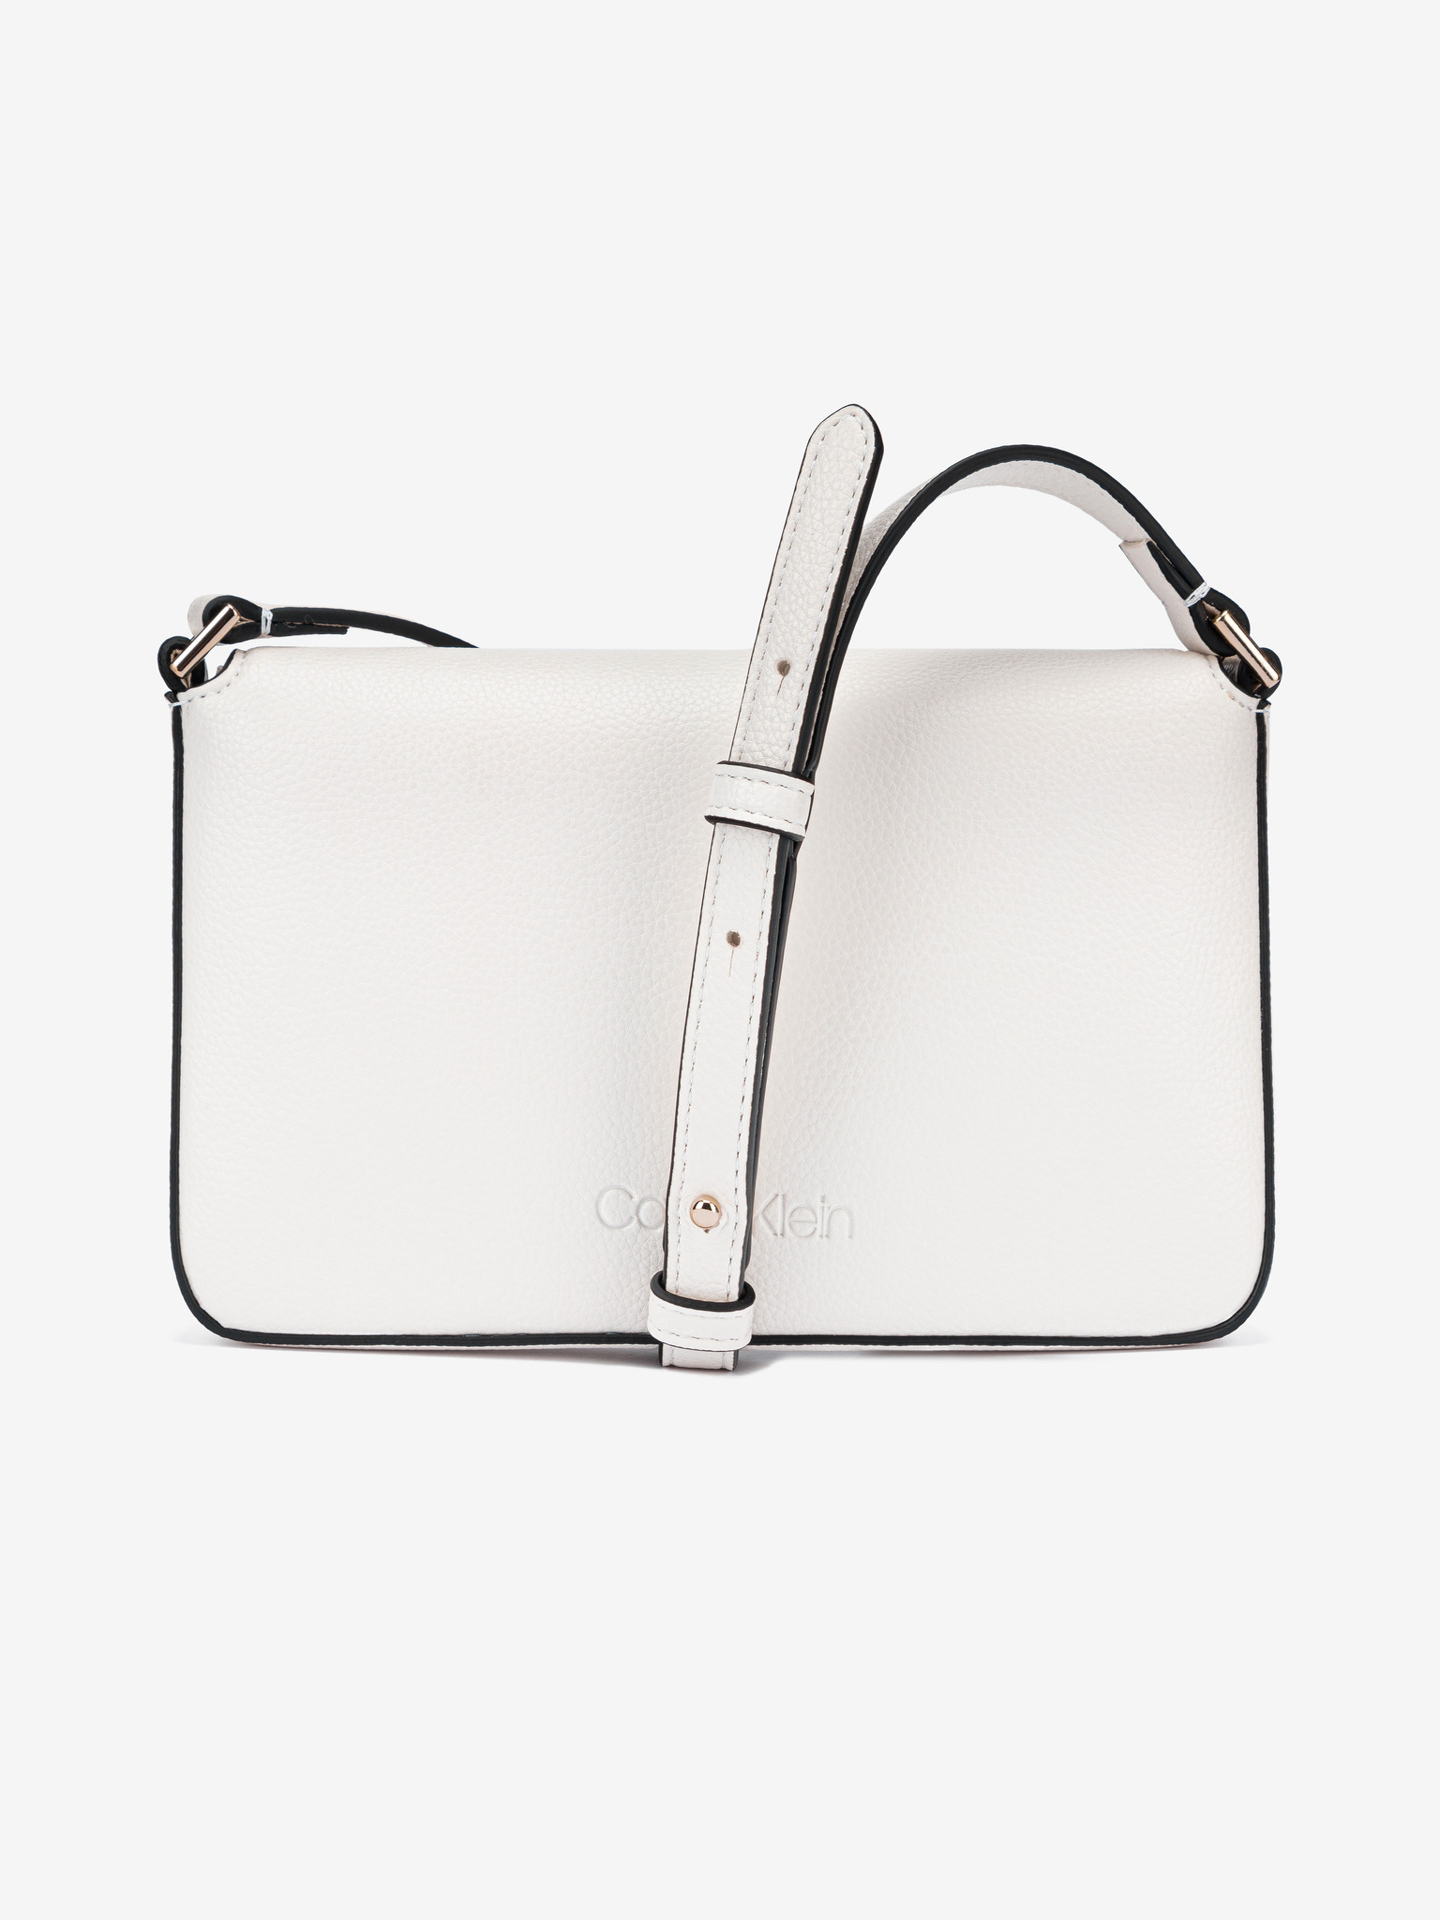 Calvin Klein white crossbody handbag Ew Flap